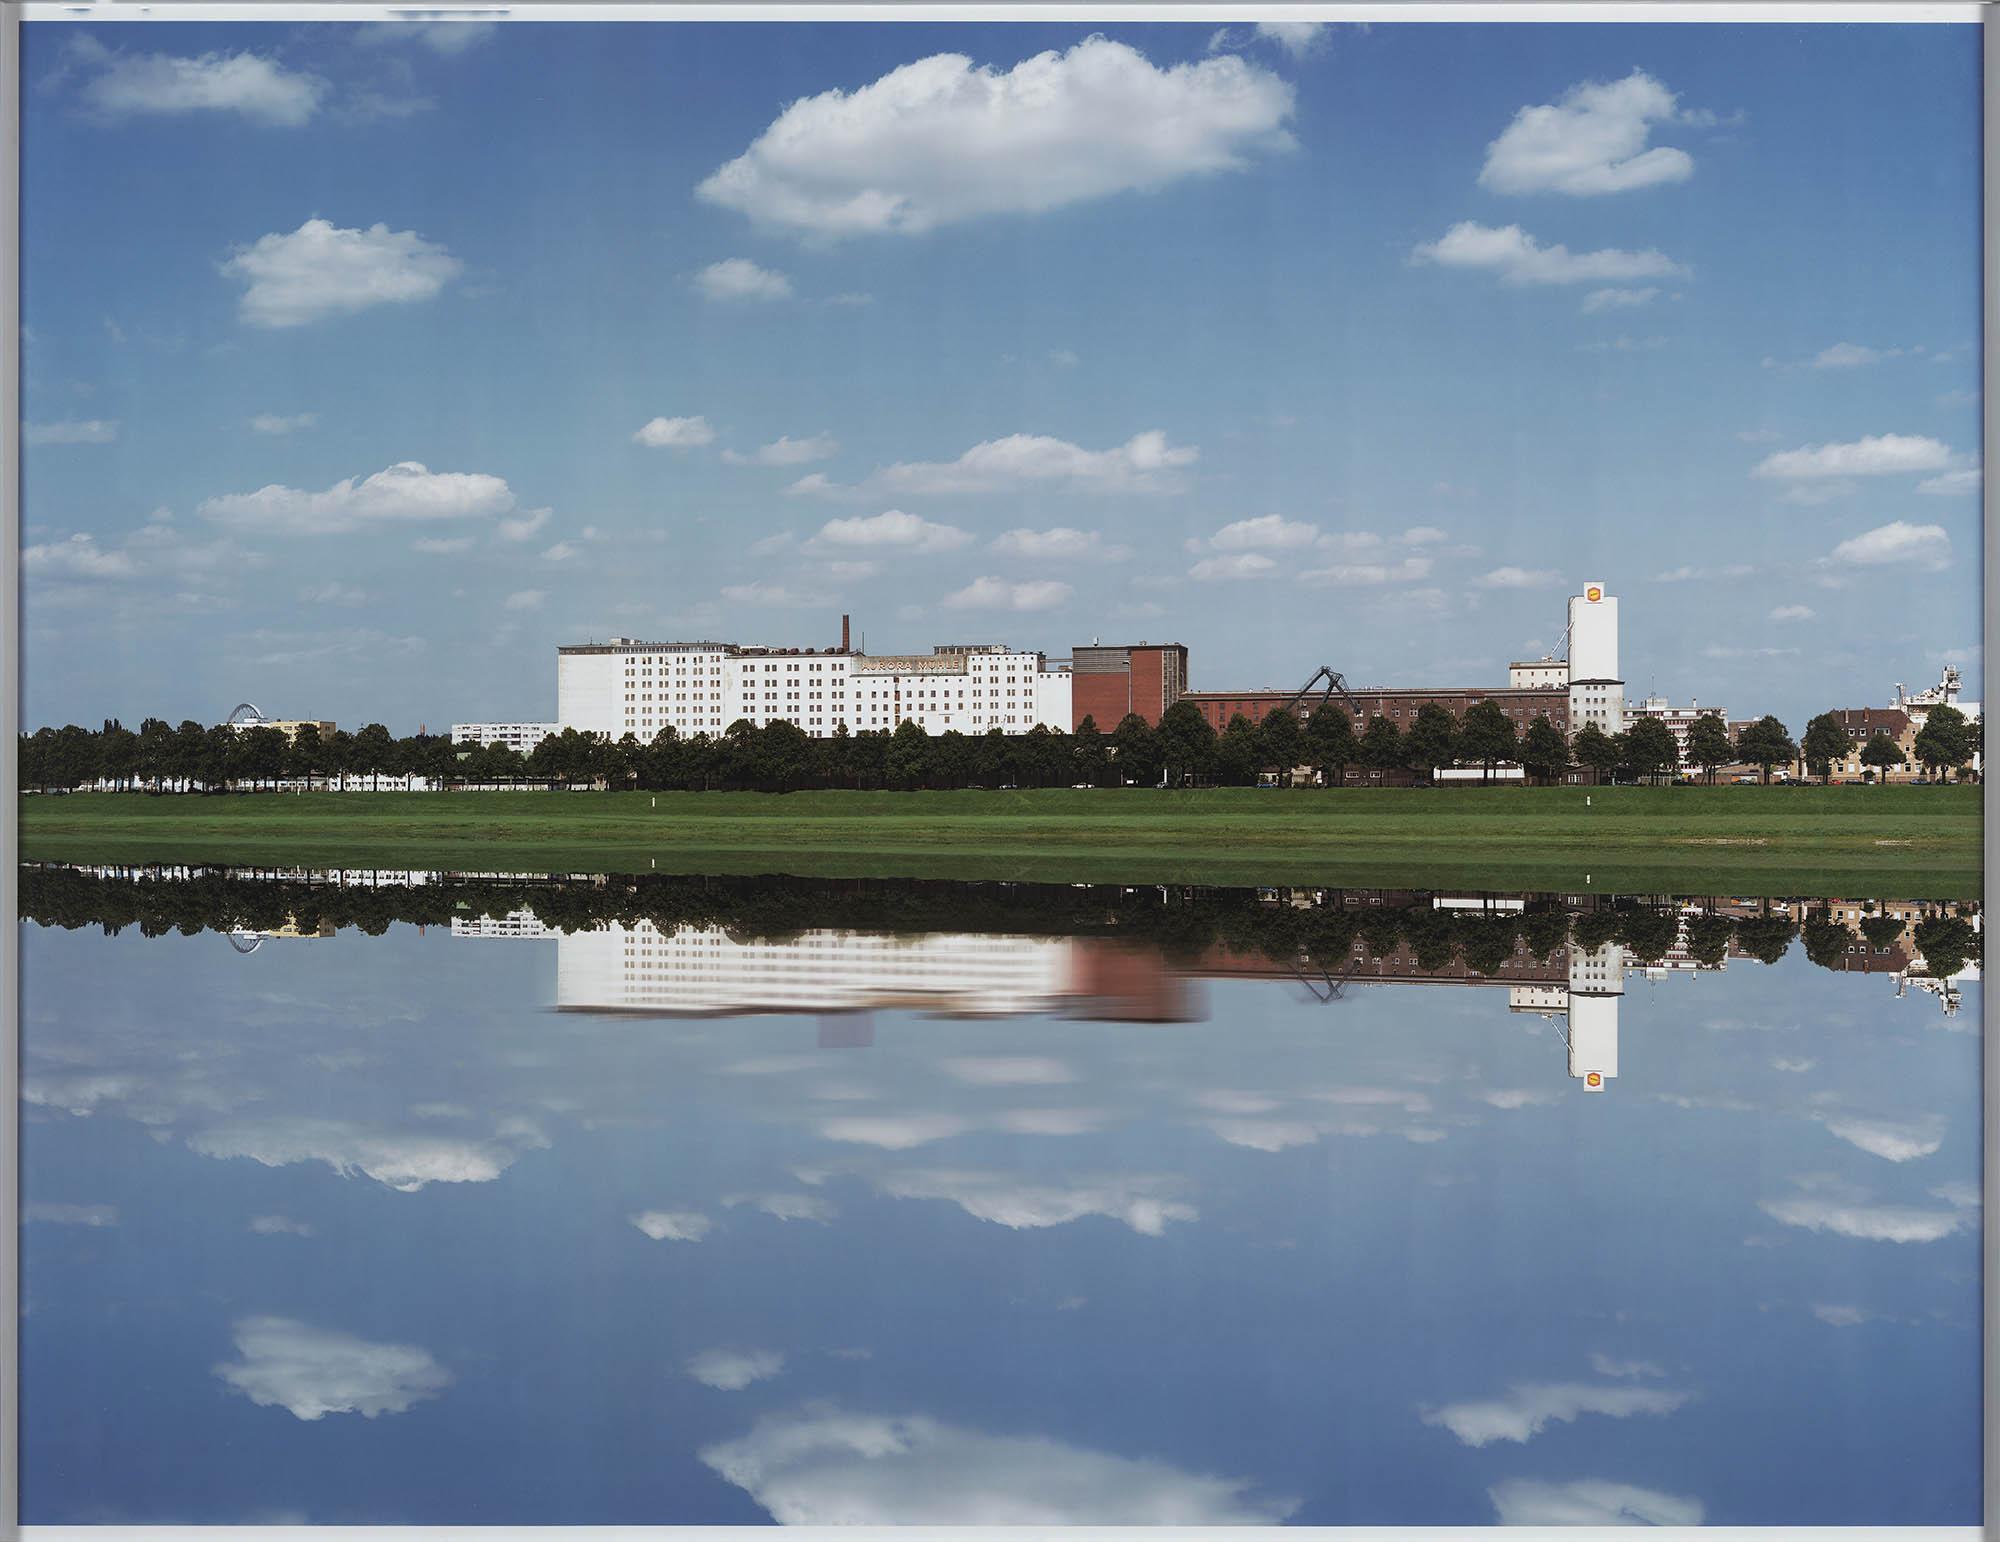 Image of Florian Maier Aichen, Factory, 2001